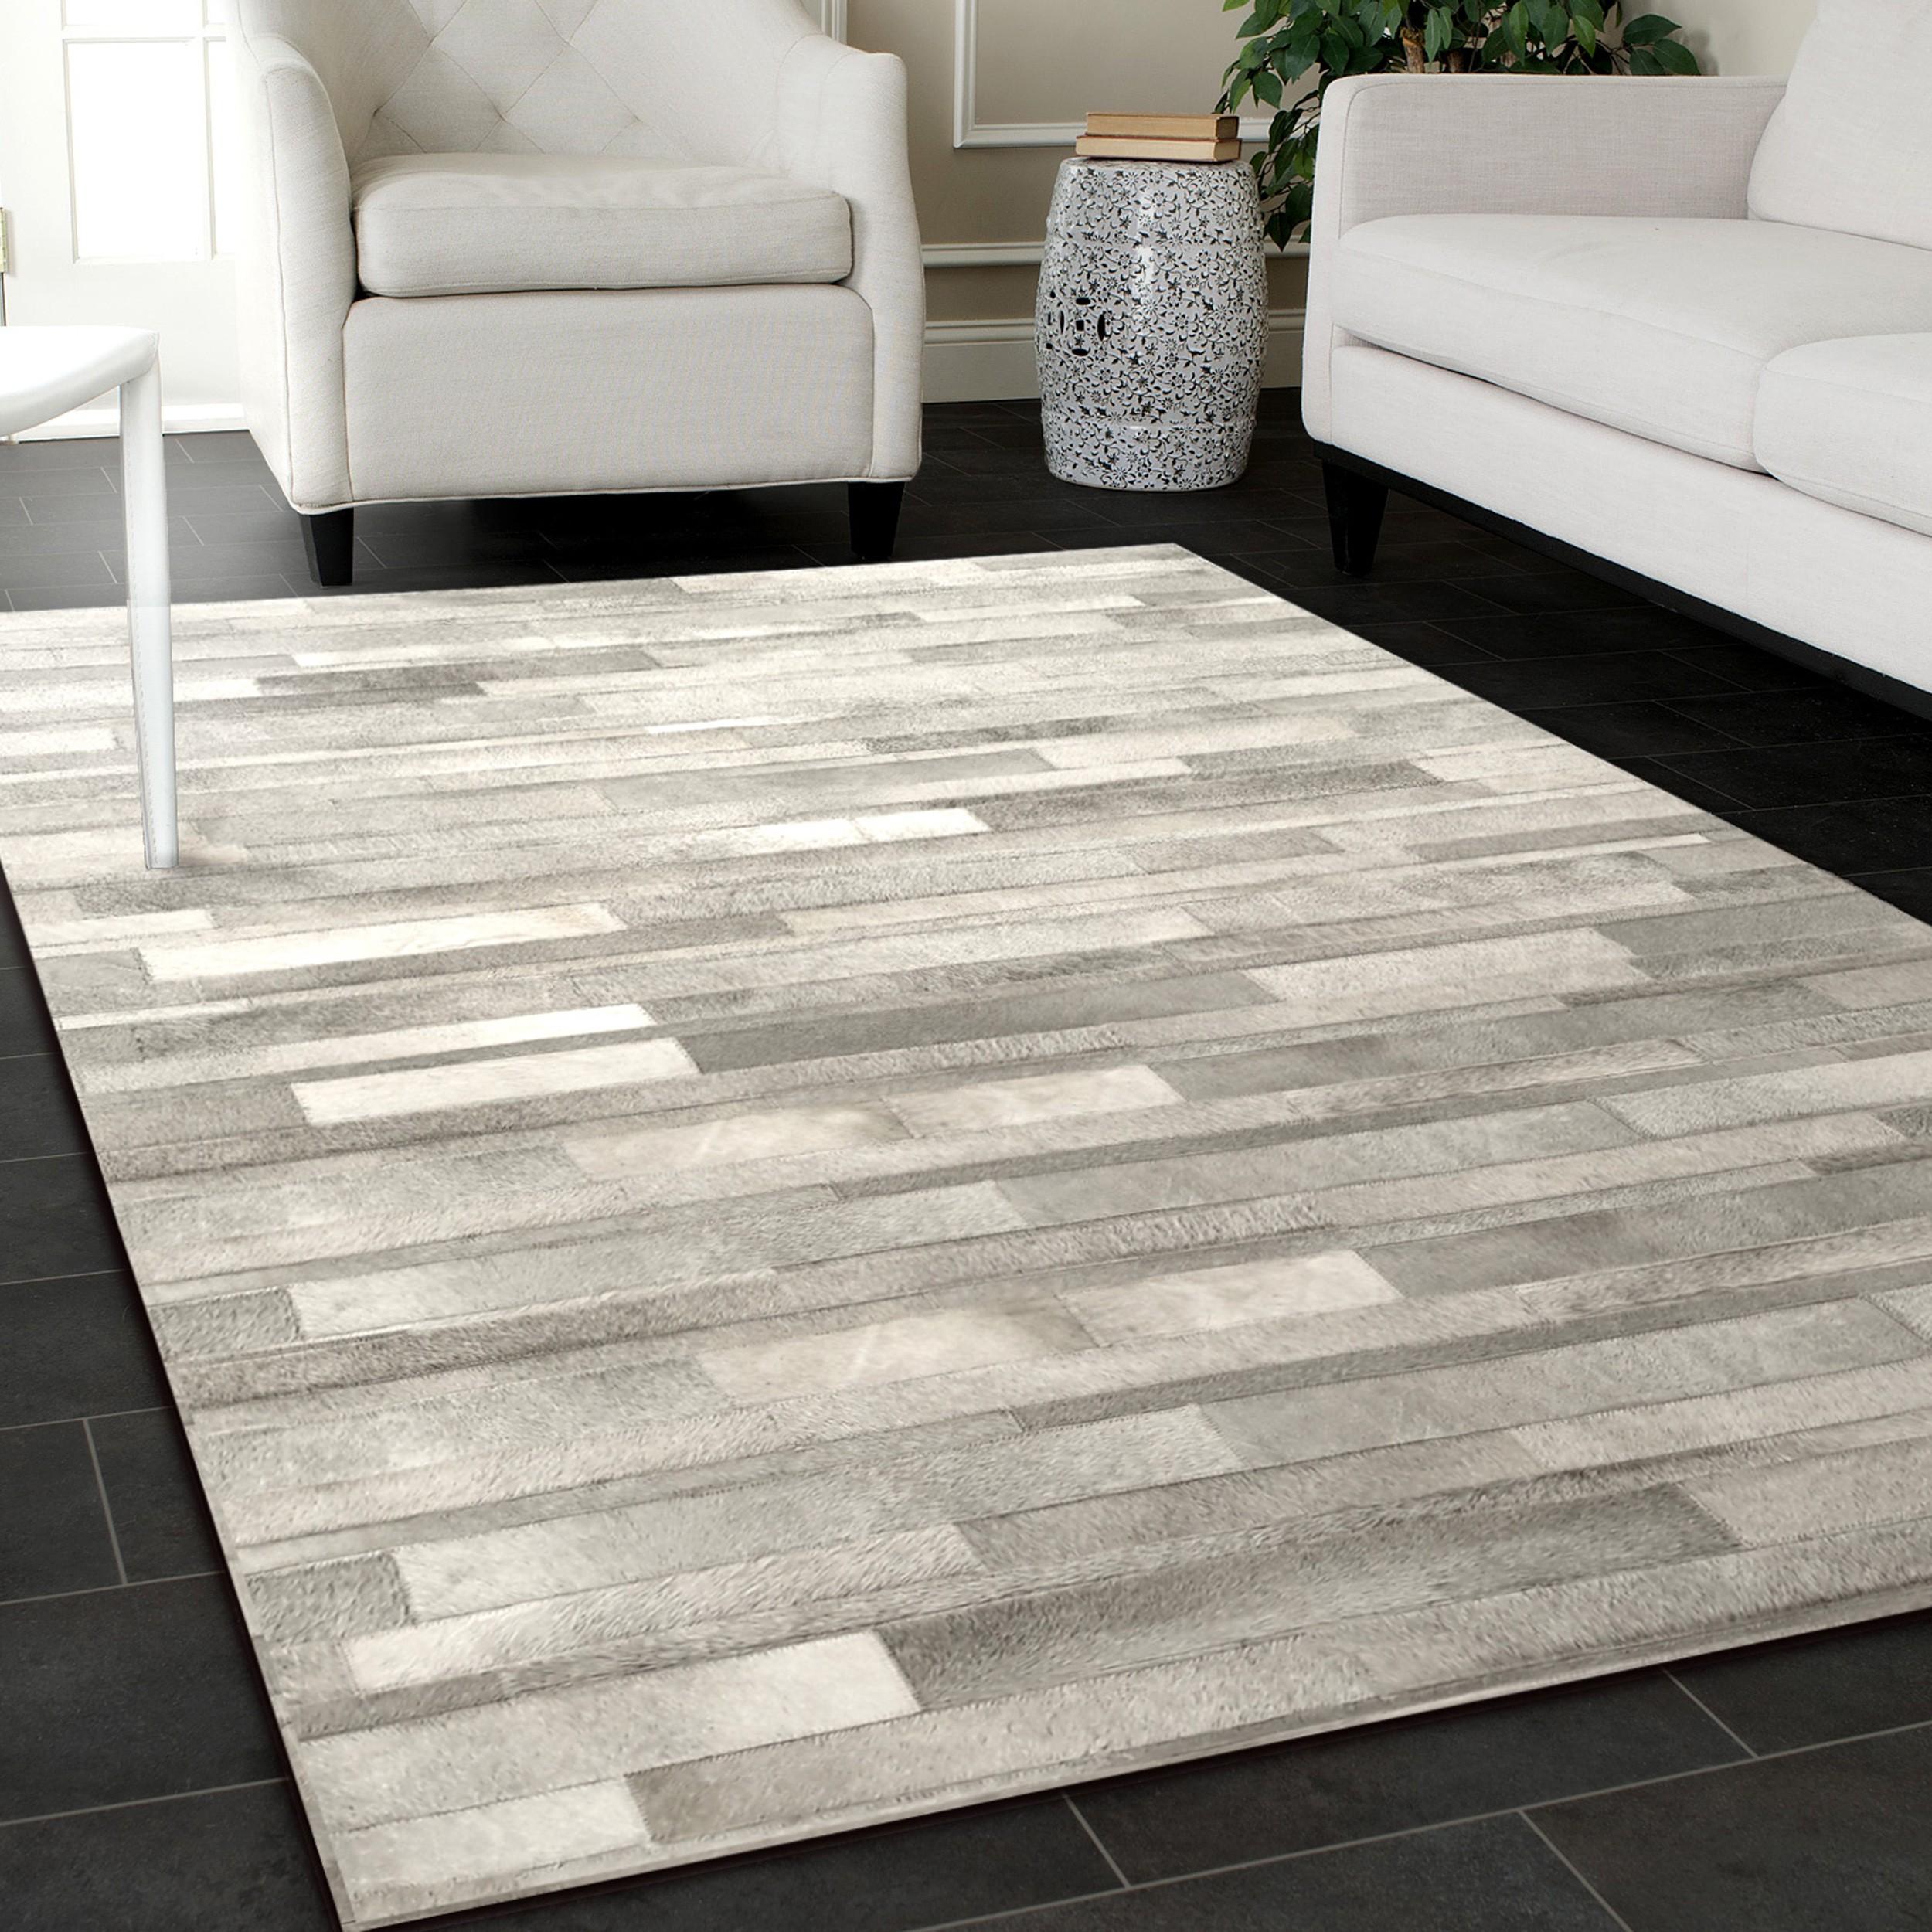 acheter tapis cuir gris clair - Tapis 200x300